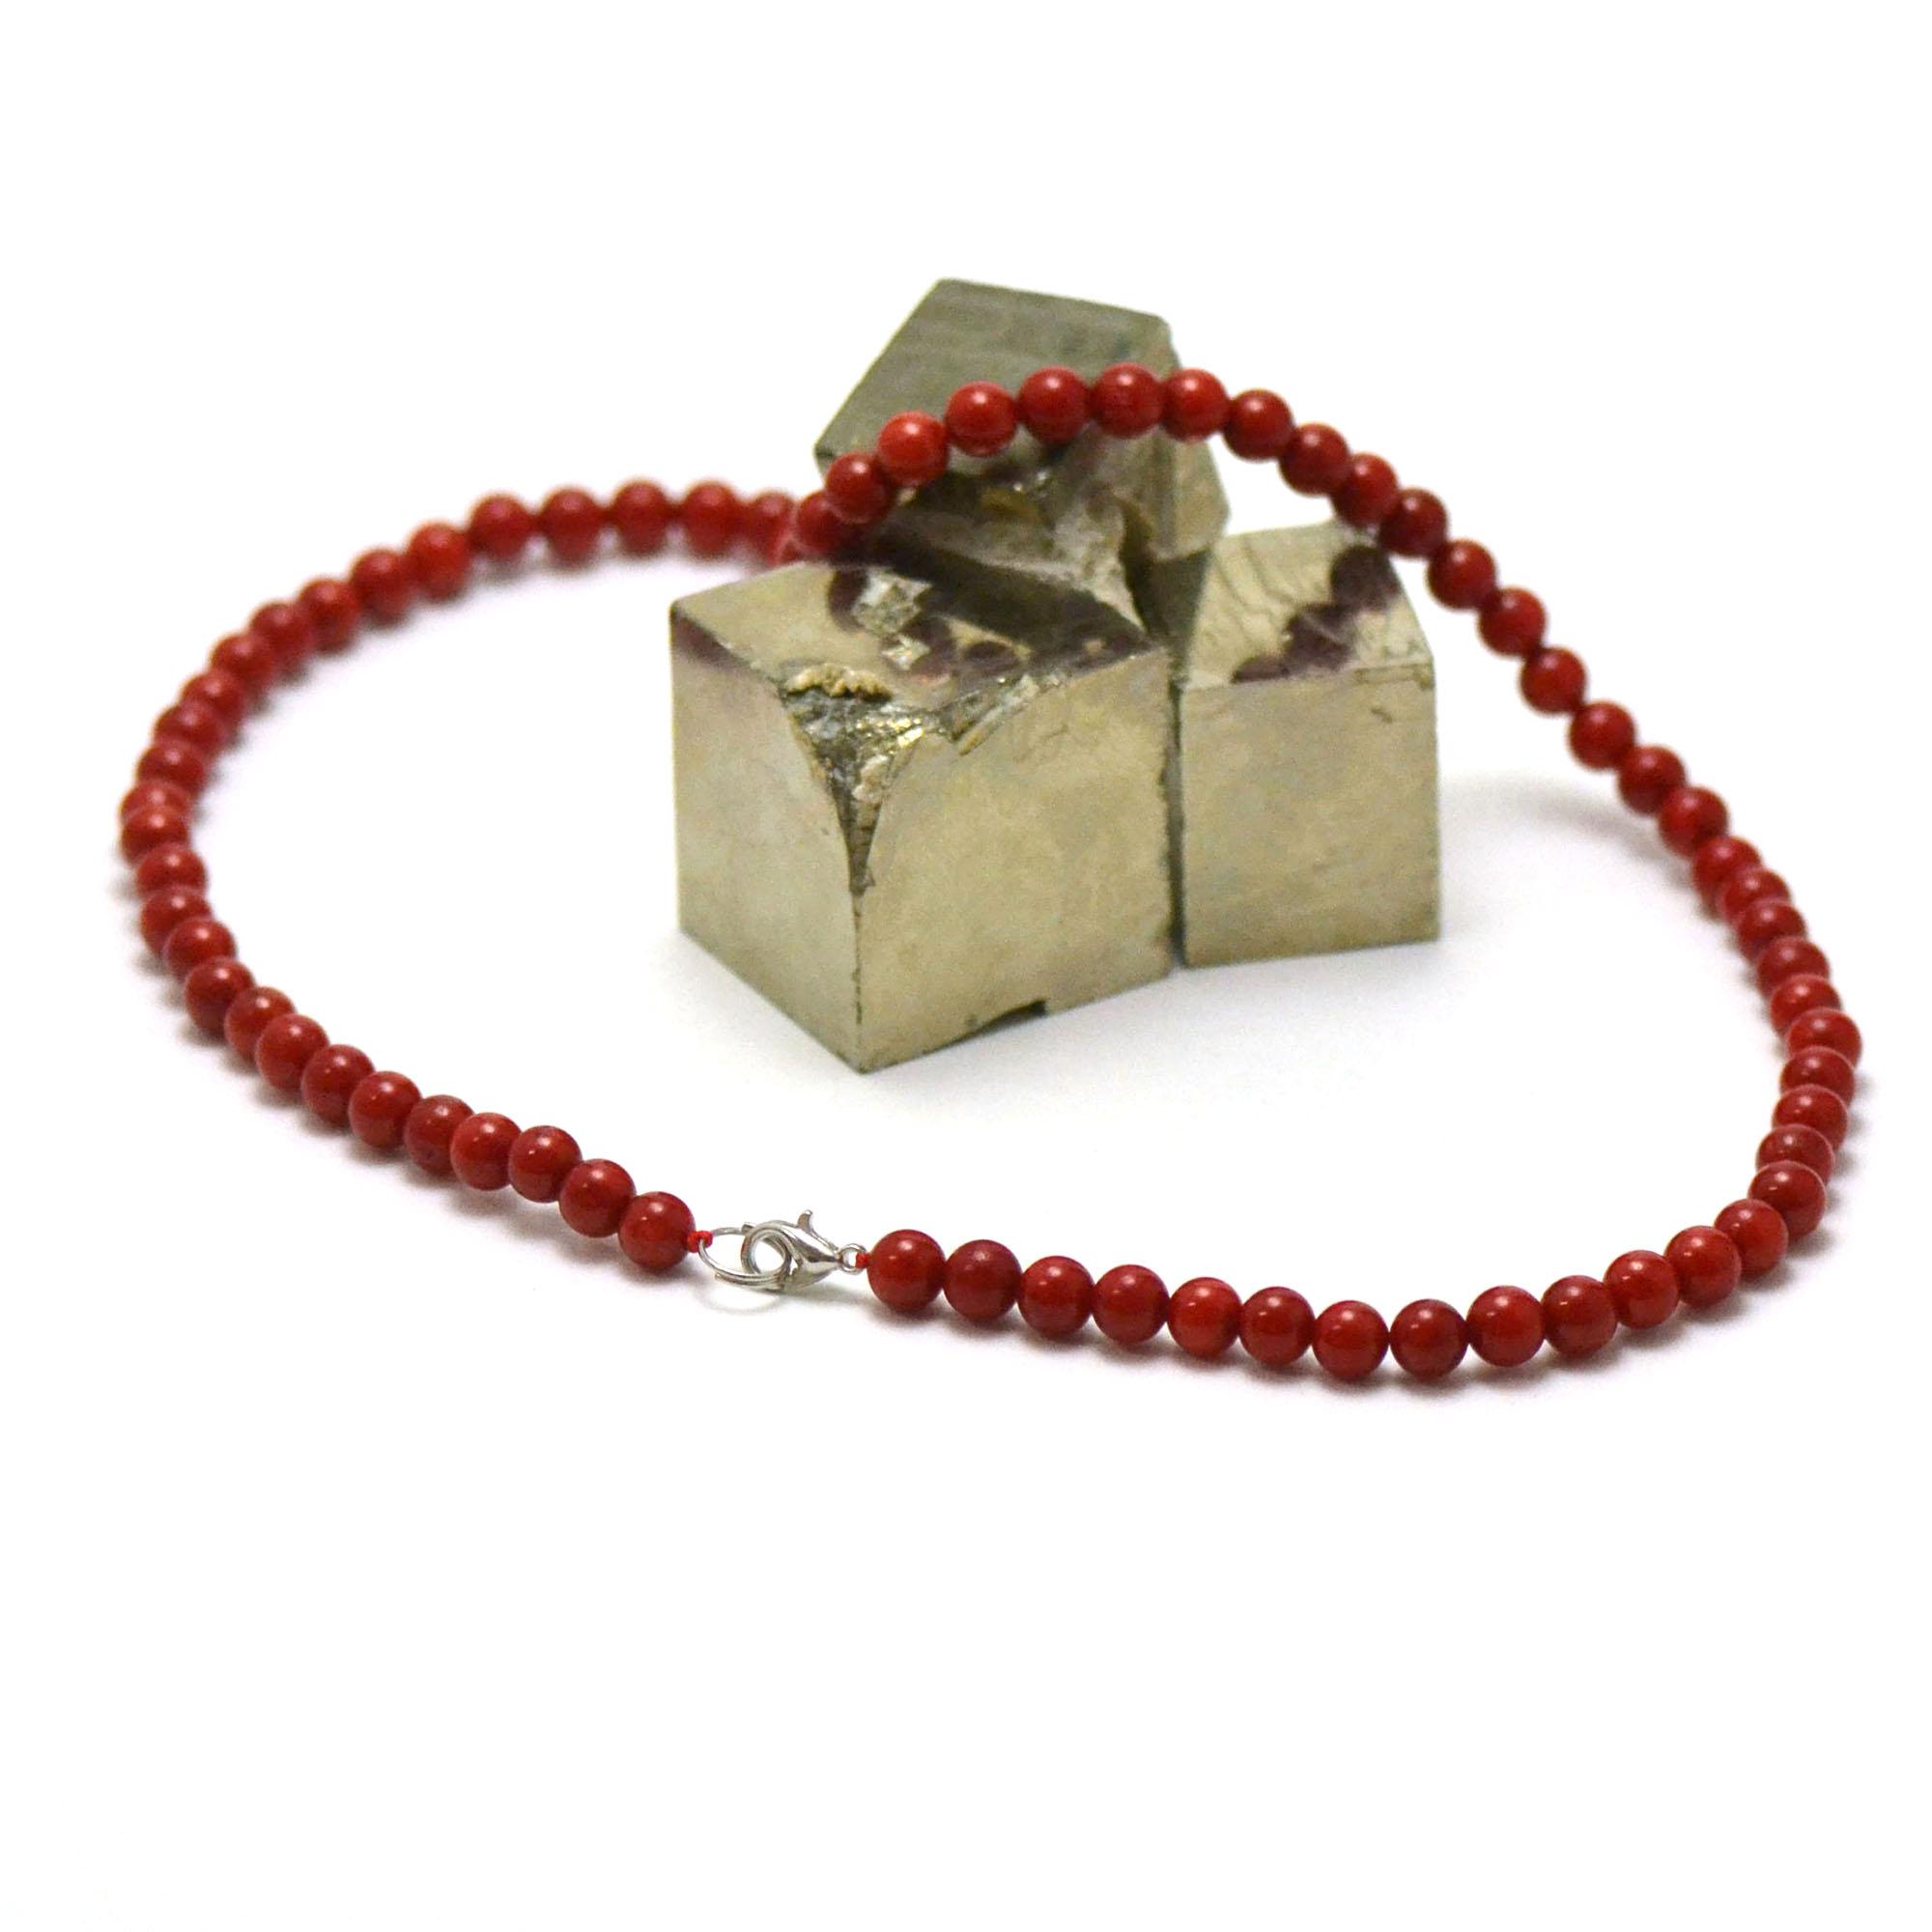 collier corail /bambou de mer ,perle ronde 6 mm